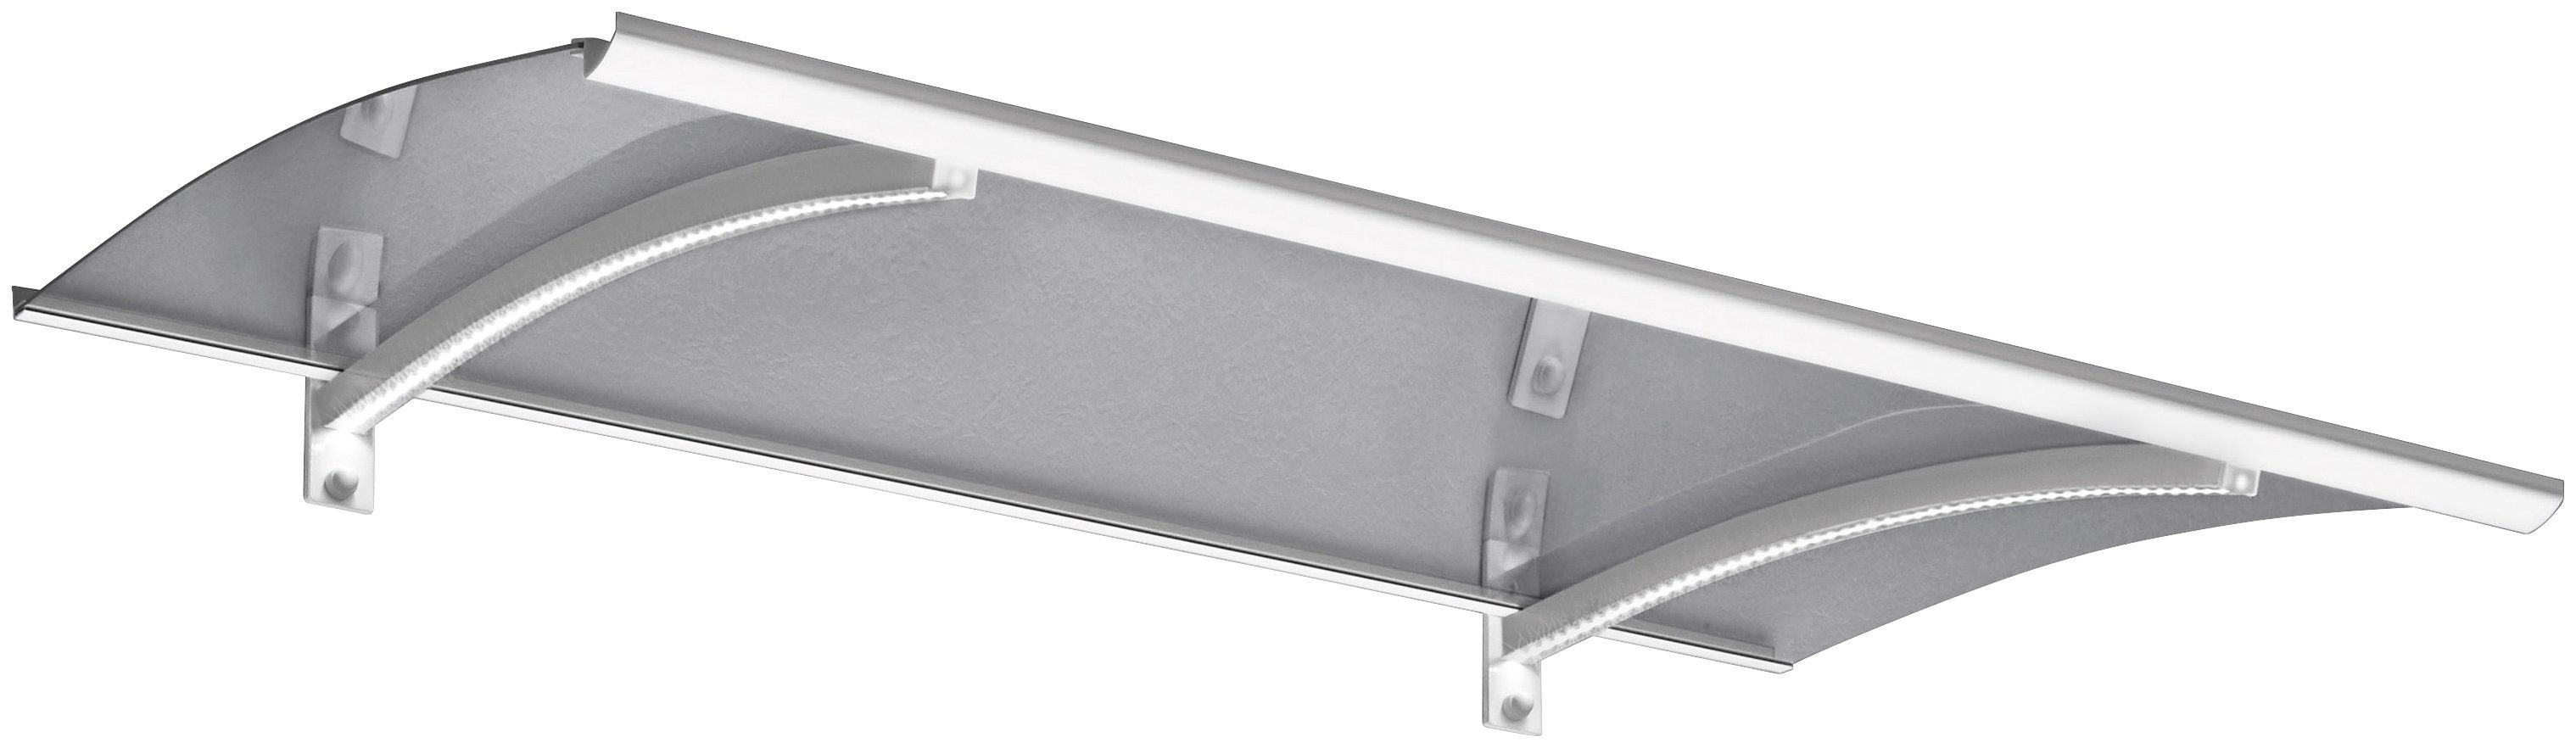 Gutta Pultvordach »LED-Technik«, 150x90x22 cm, weiß-transparent